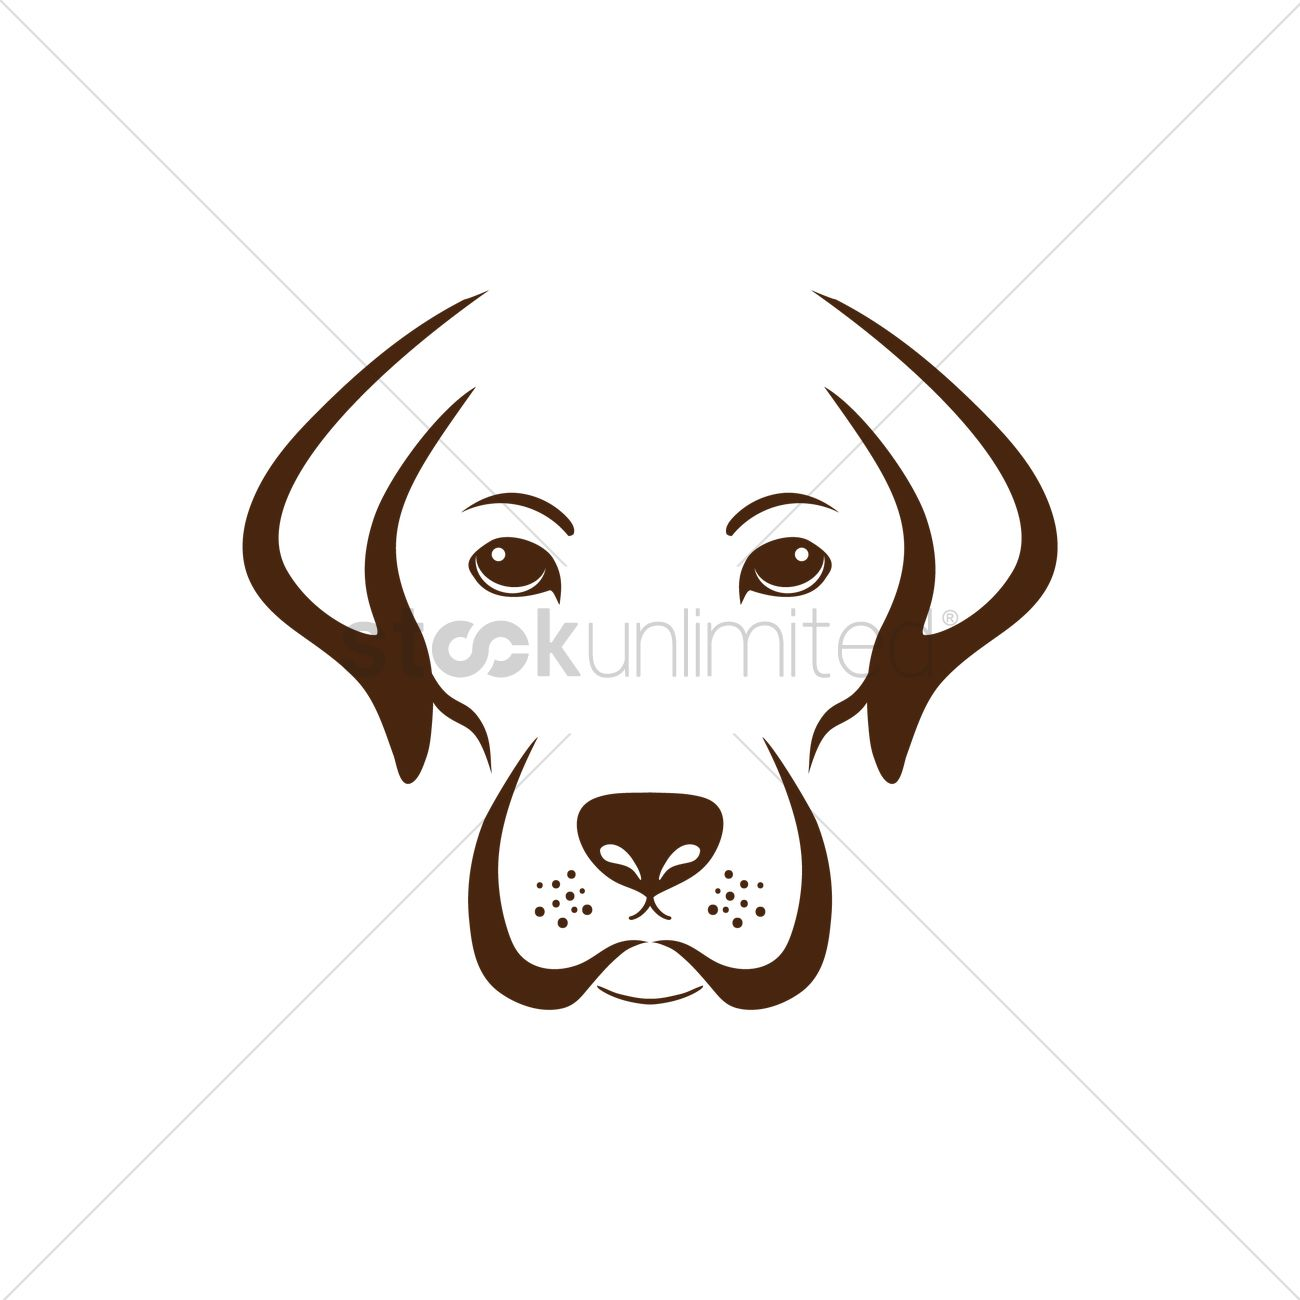 1300x1300 Simple Dog Design Vector Image